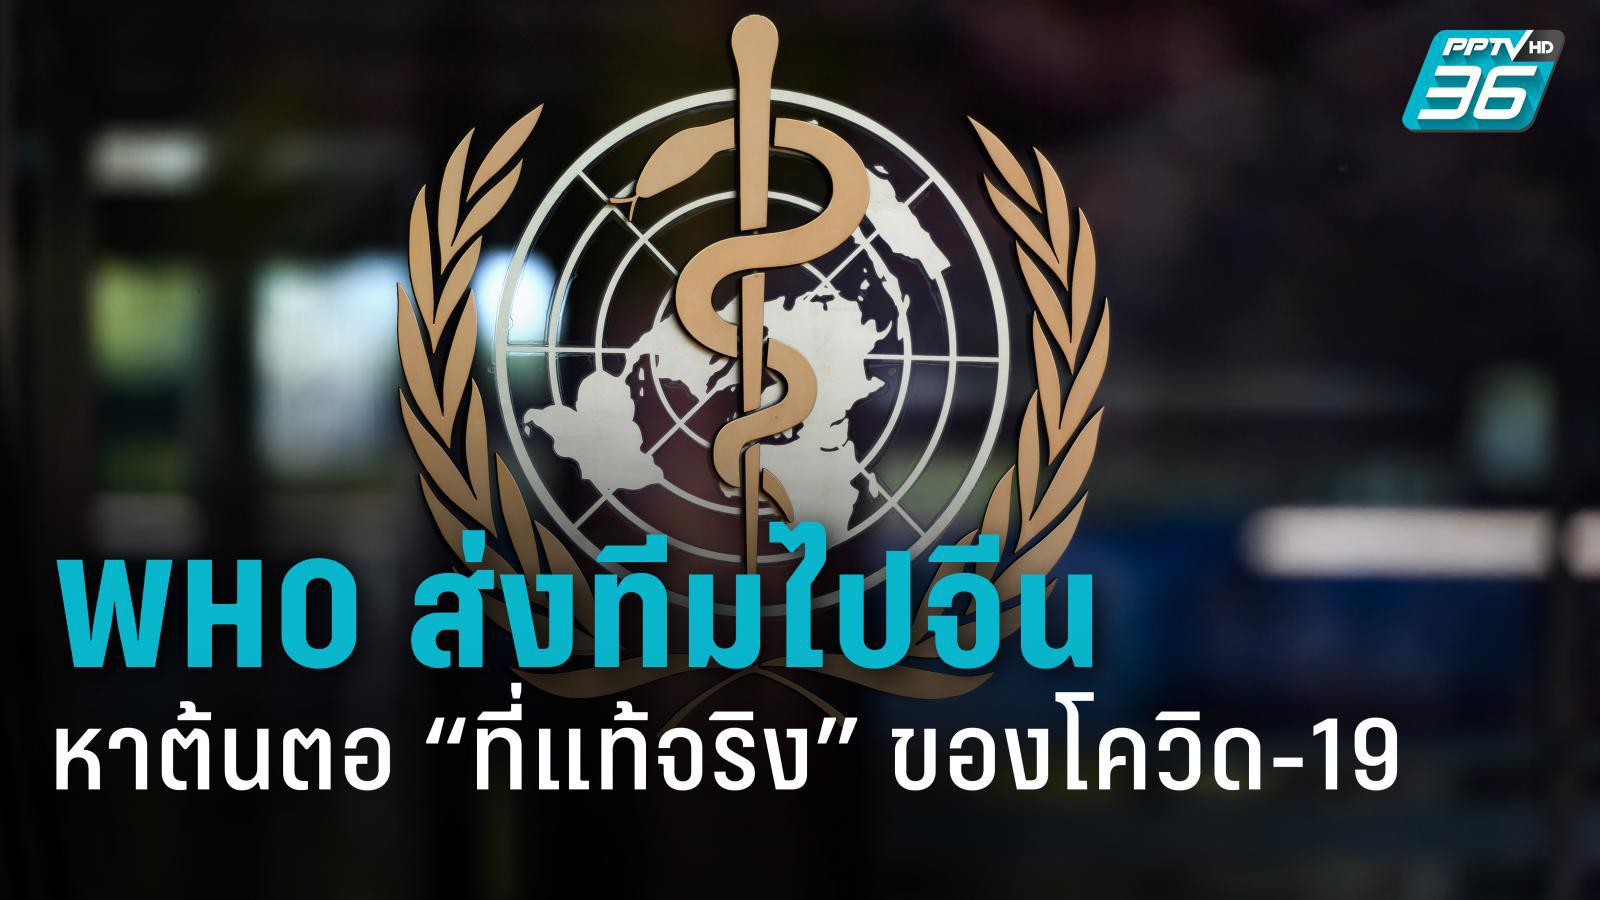 WHO เตรียมส่งทีมไปจีน สืบหาต้นตอของไวรัสโคโรนาสายพันธุ์ใหม่